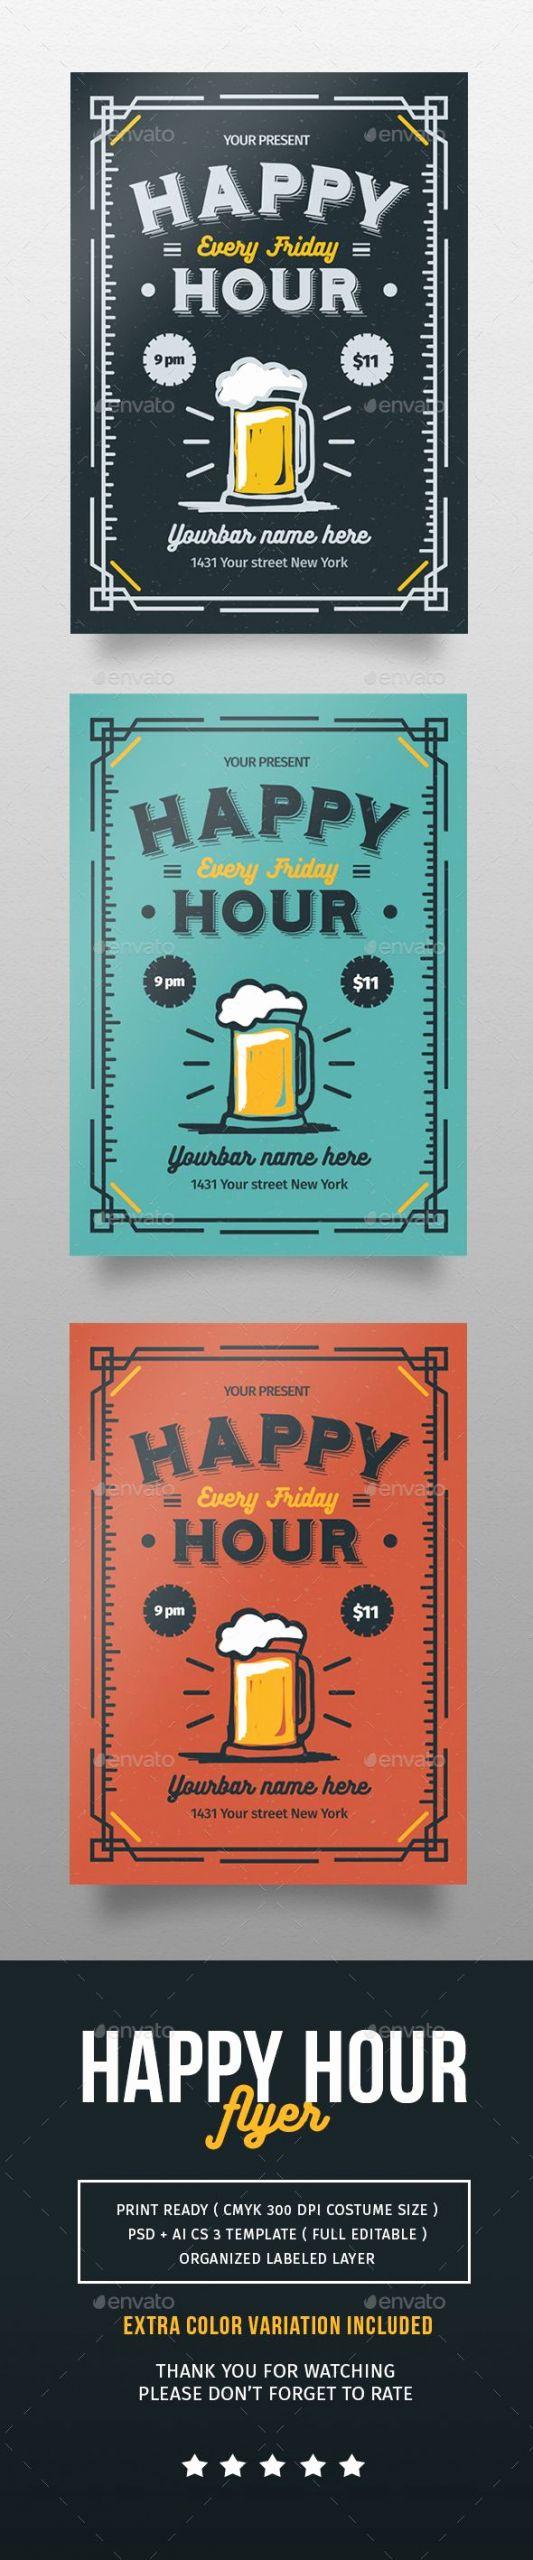 Happy Hour Menu Template Inspirational Best 25 Happy Hour Ideas On Pinterest